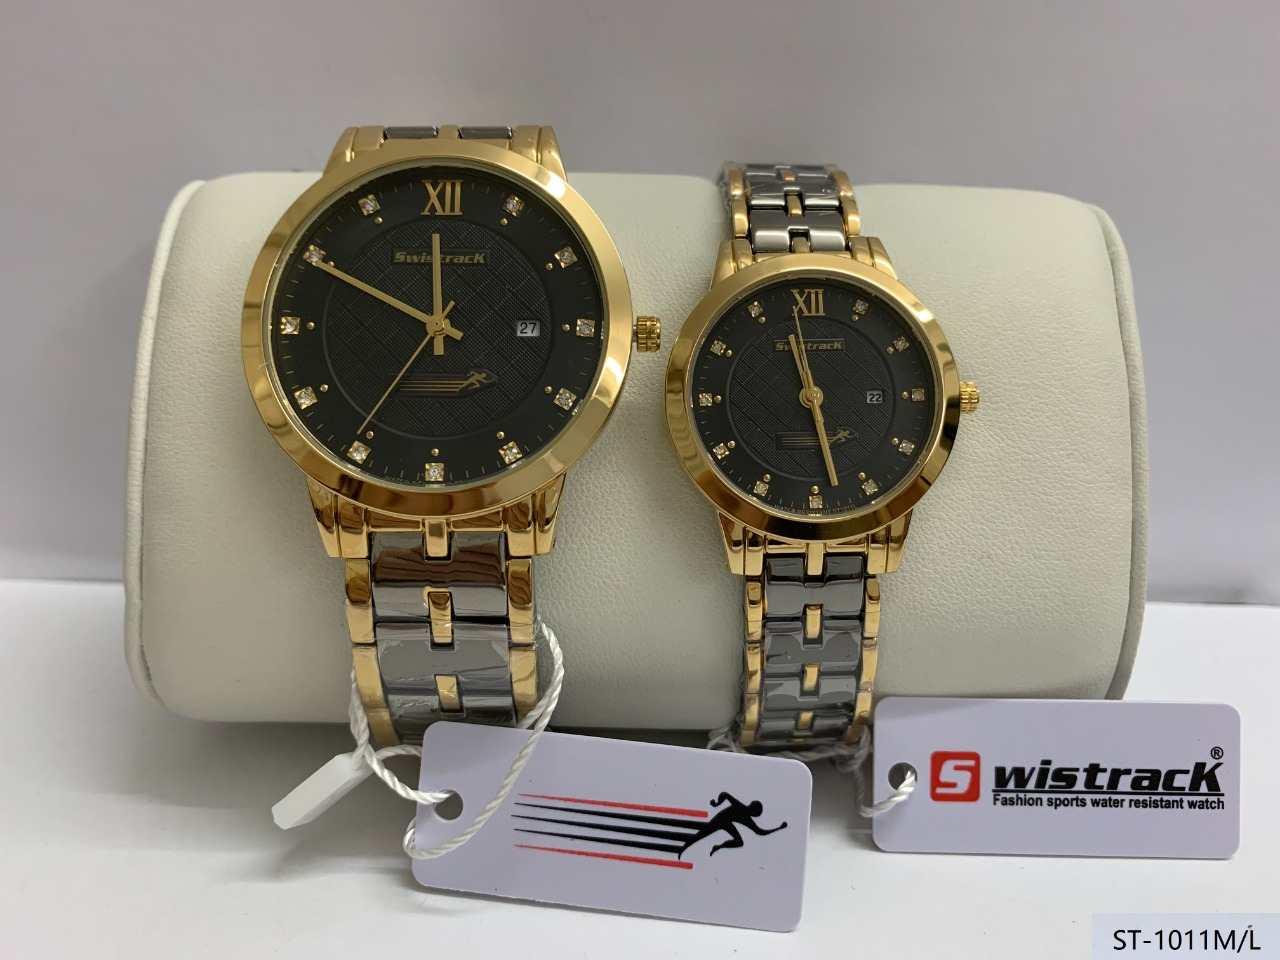 Swistrack Couple Watches